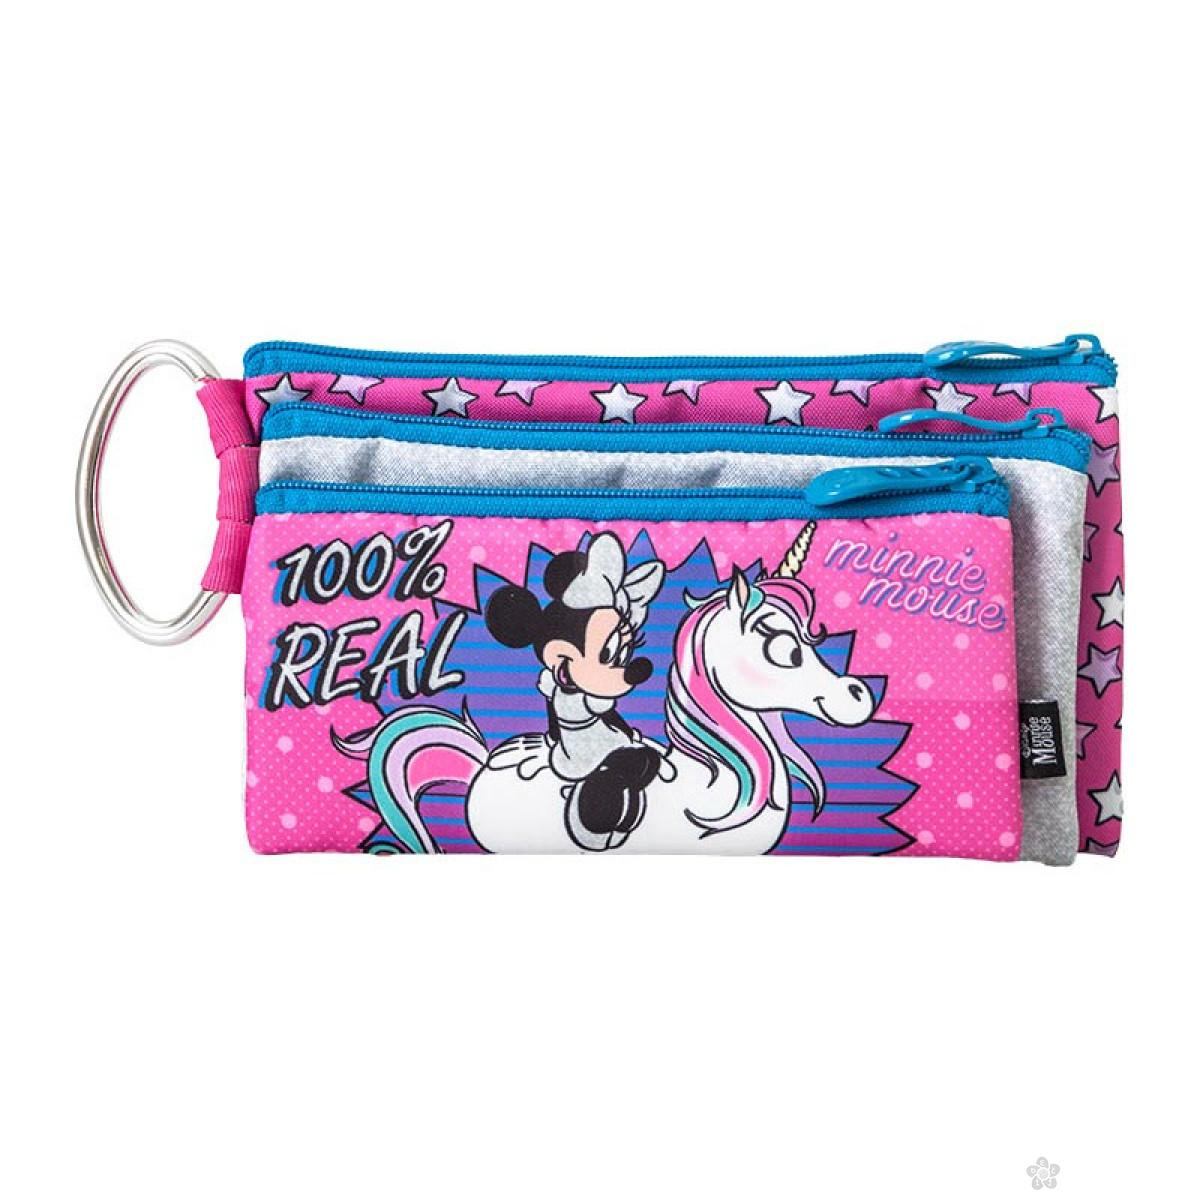 Pernica prazna trodelna Minnie Mouse Unicorn, 318654